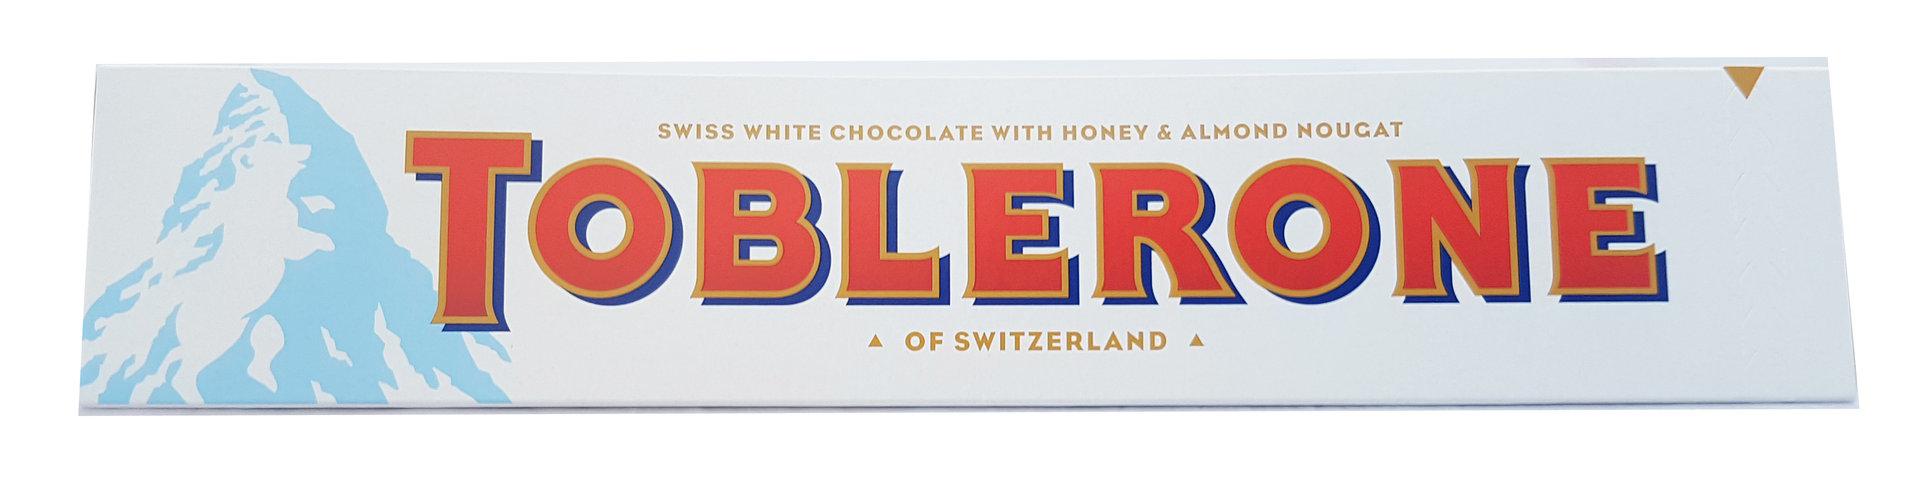 Toblerone Large White Chocolate Bar 360g